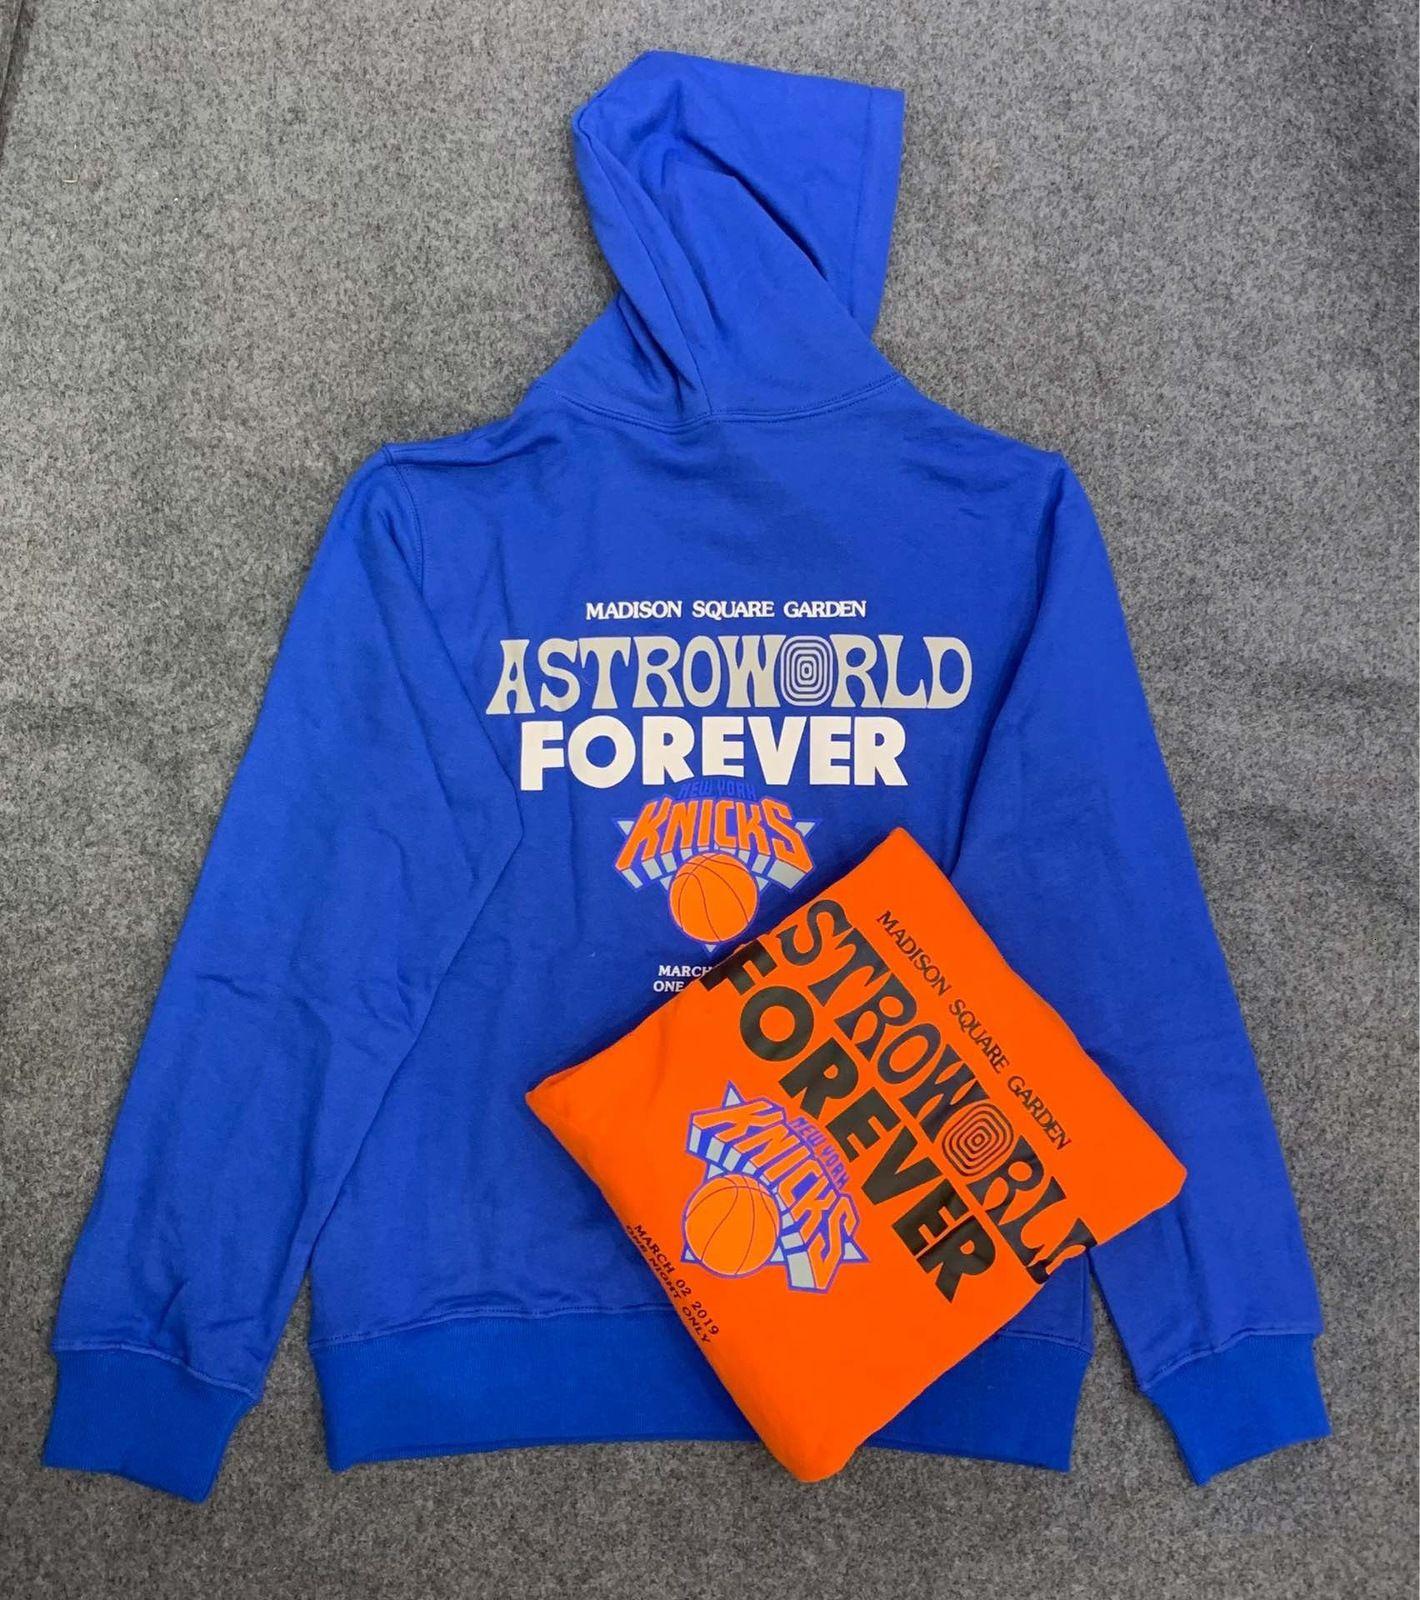 2021 Yeni FW Travis Scott Astroworld Dünya Msg Knicks Sonsuza Baskı Kadın Hoodies Hoody Hiphop Boy Erkekler Rahat Hoodie Kazak 1SMH